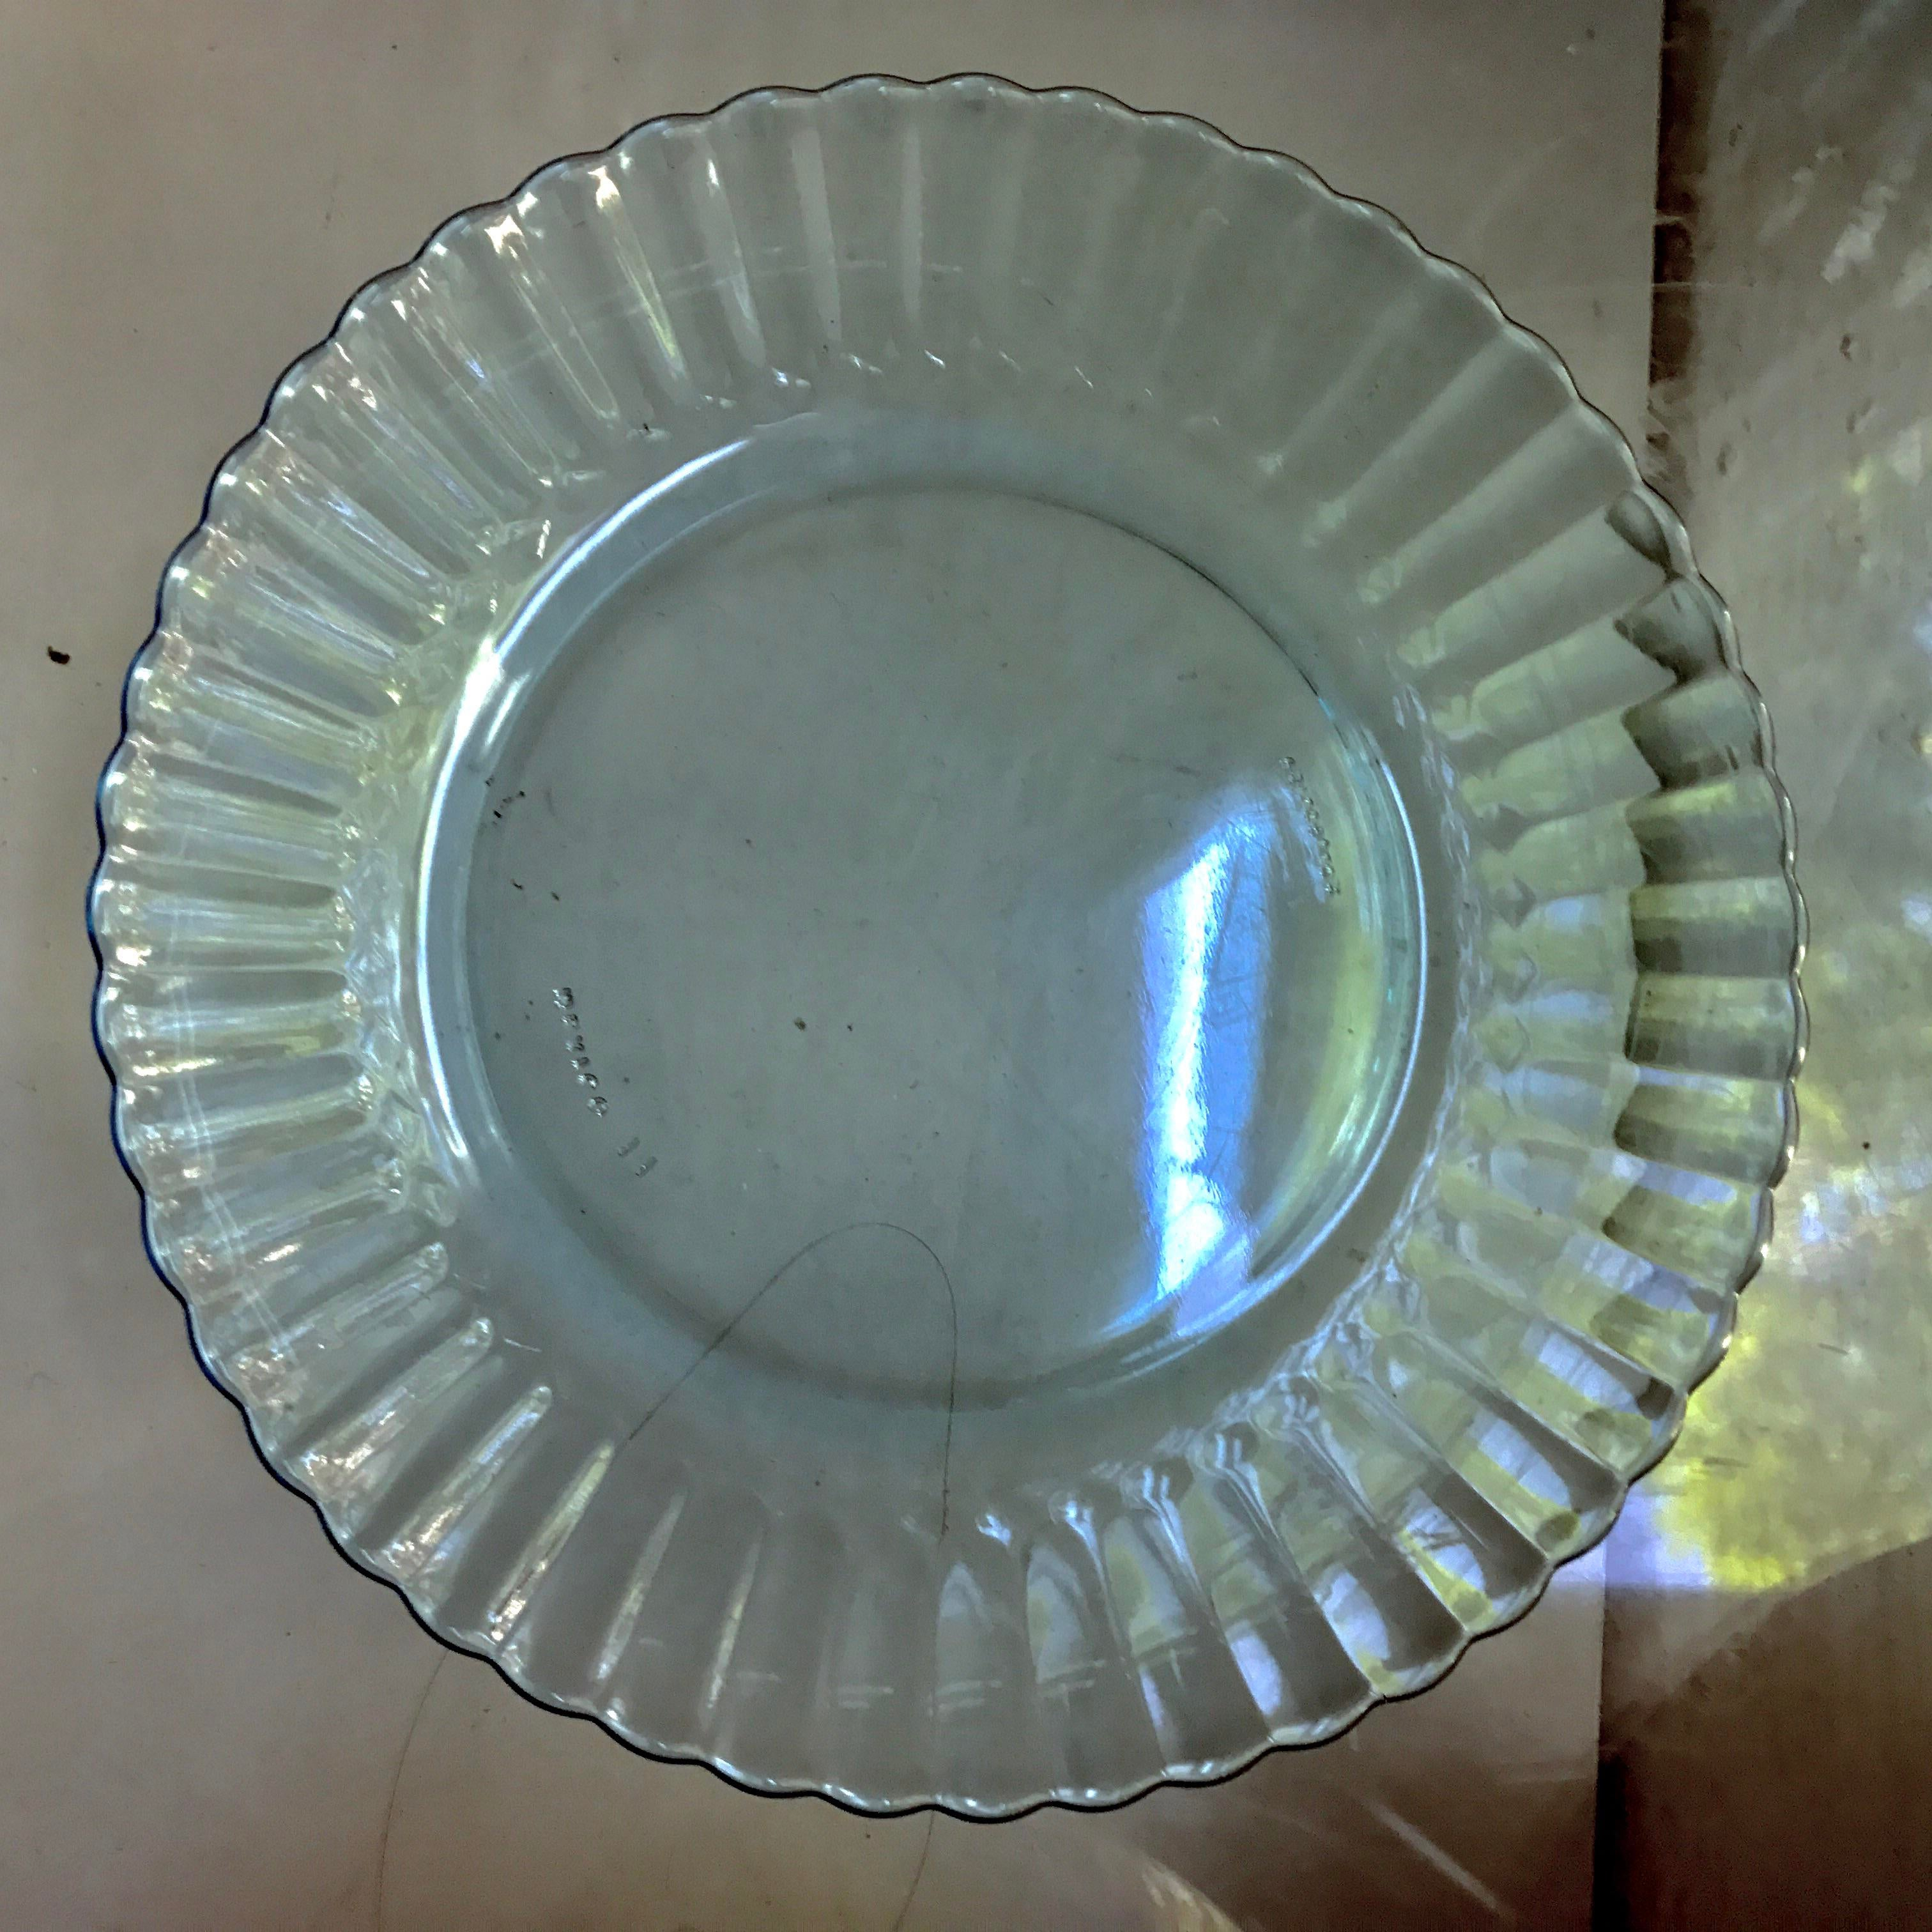 Vintage Ice Blue Fortecrisa Mexican Saucers u0026 Dessert Plates - Set of 12 - Image 11 & Vintage Ice Blue Fortecrisa Mexican Saucers u0026 Dessert Plates - Set ...